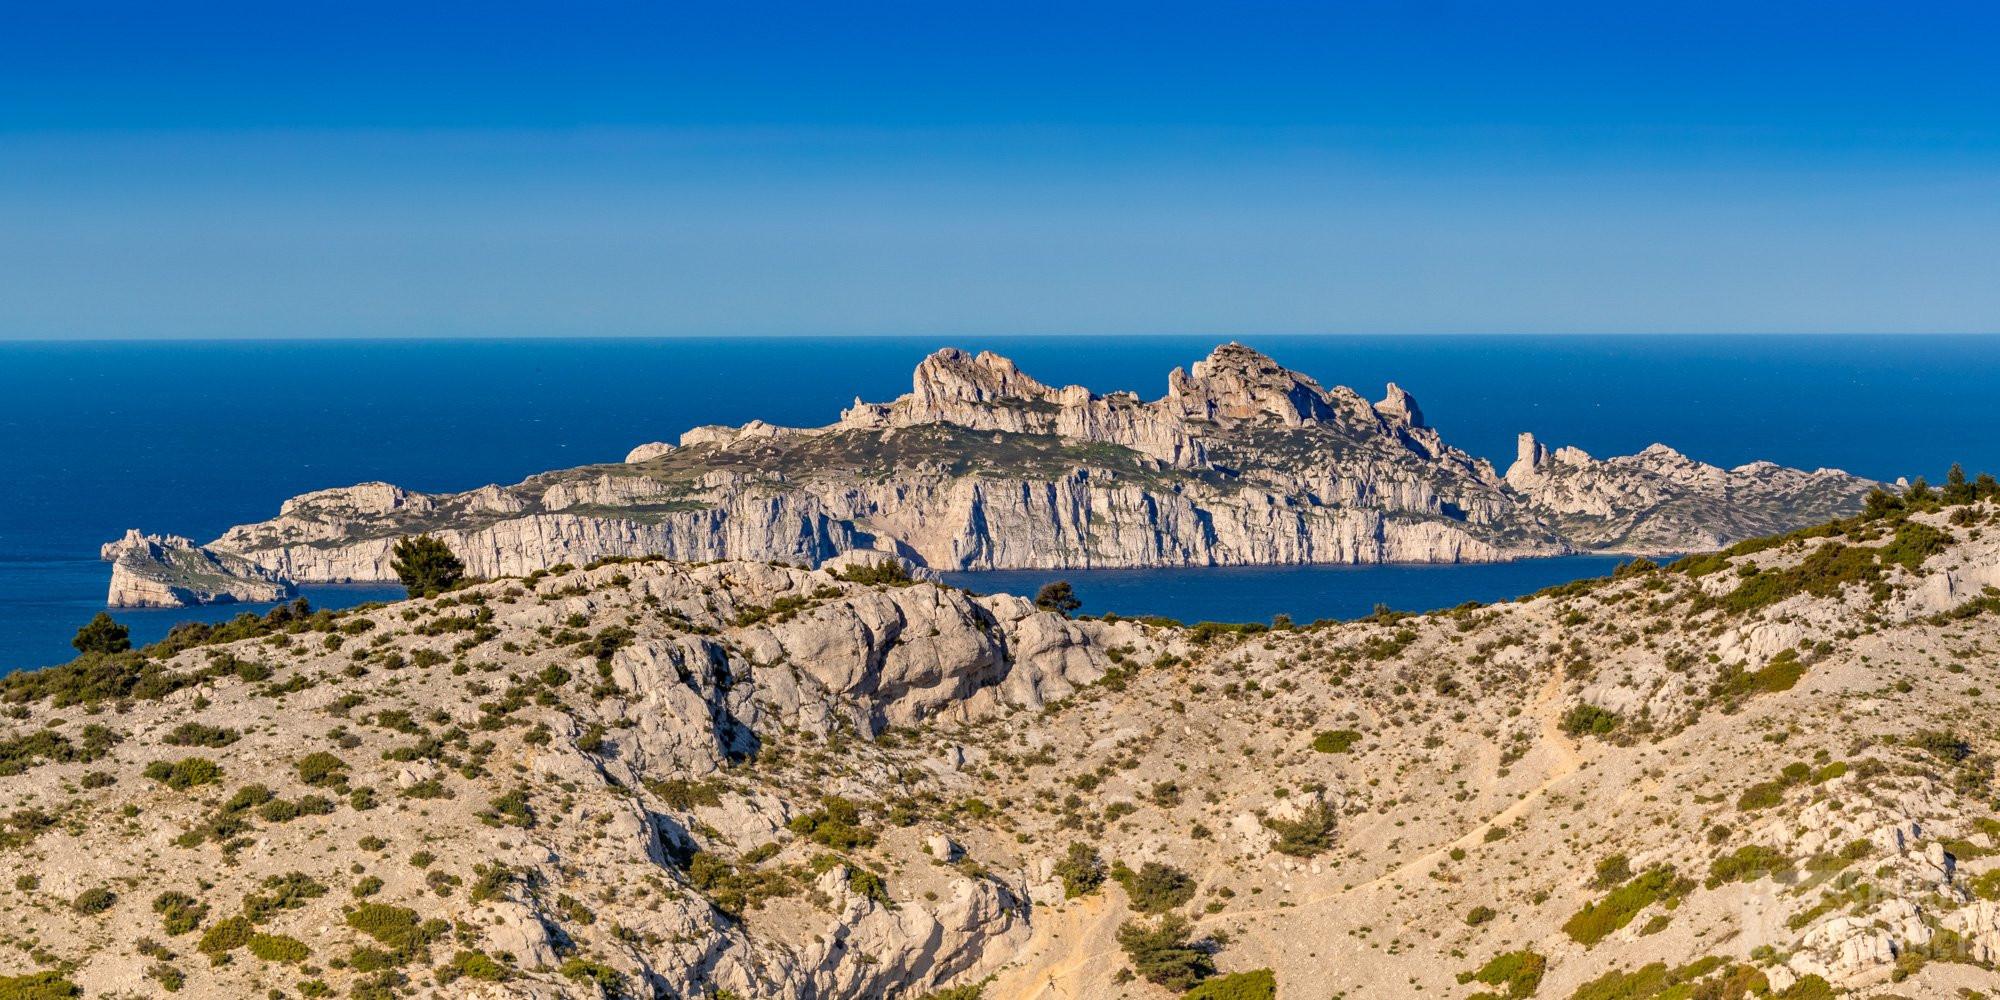 Sugiton viewpoint, Riun island Azure coast France